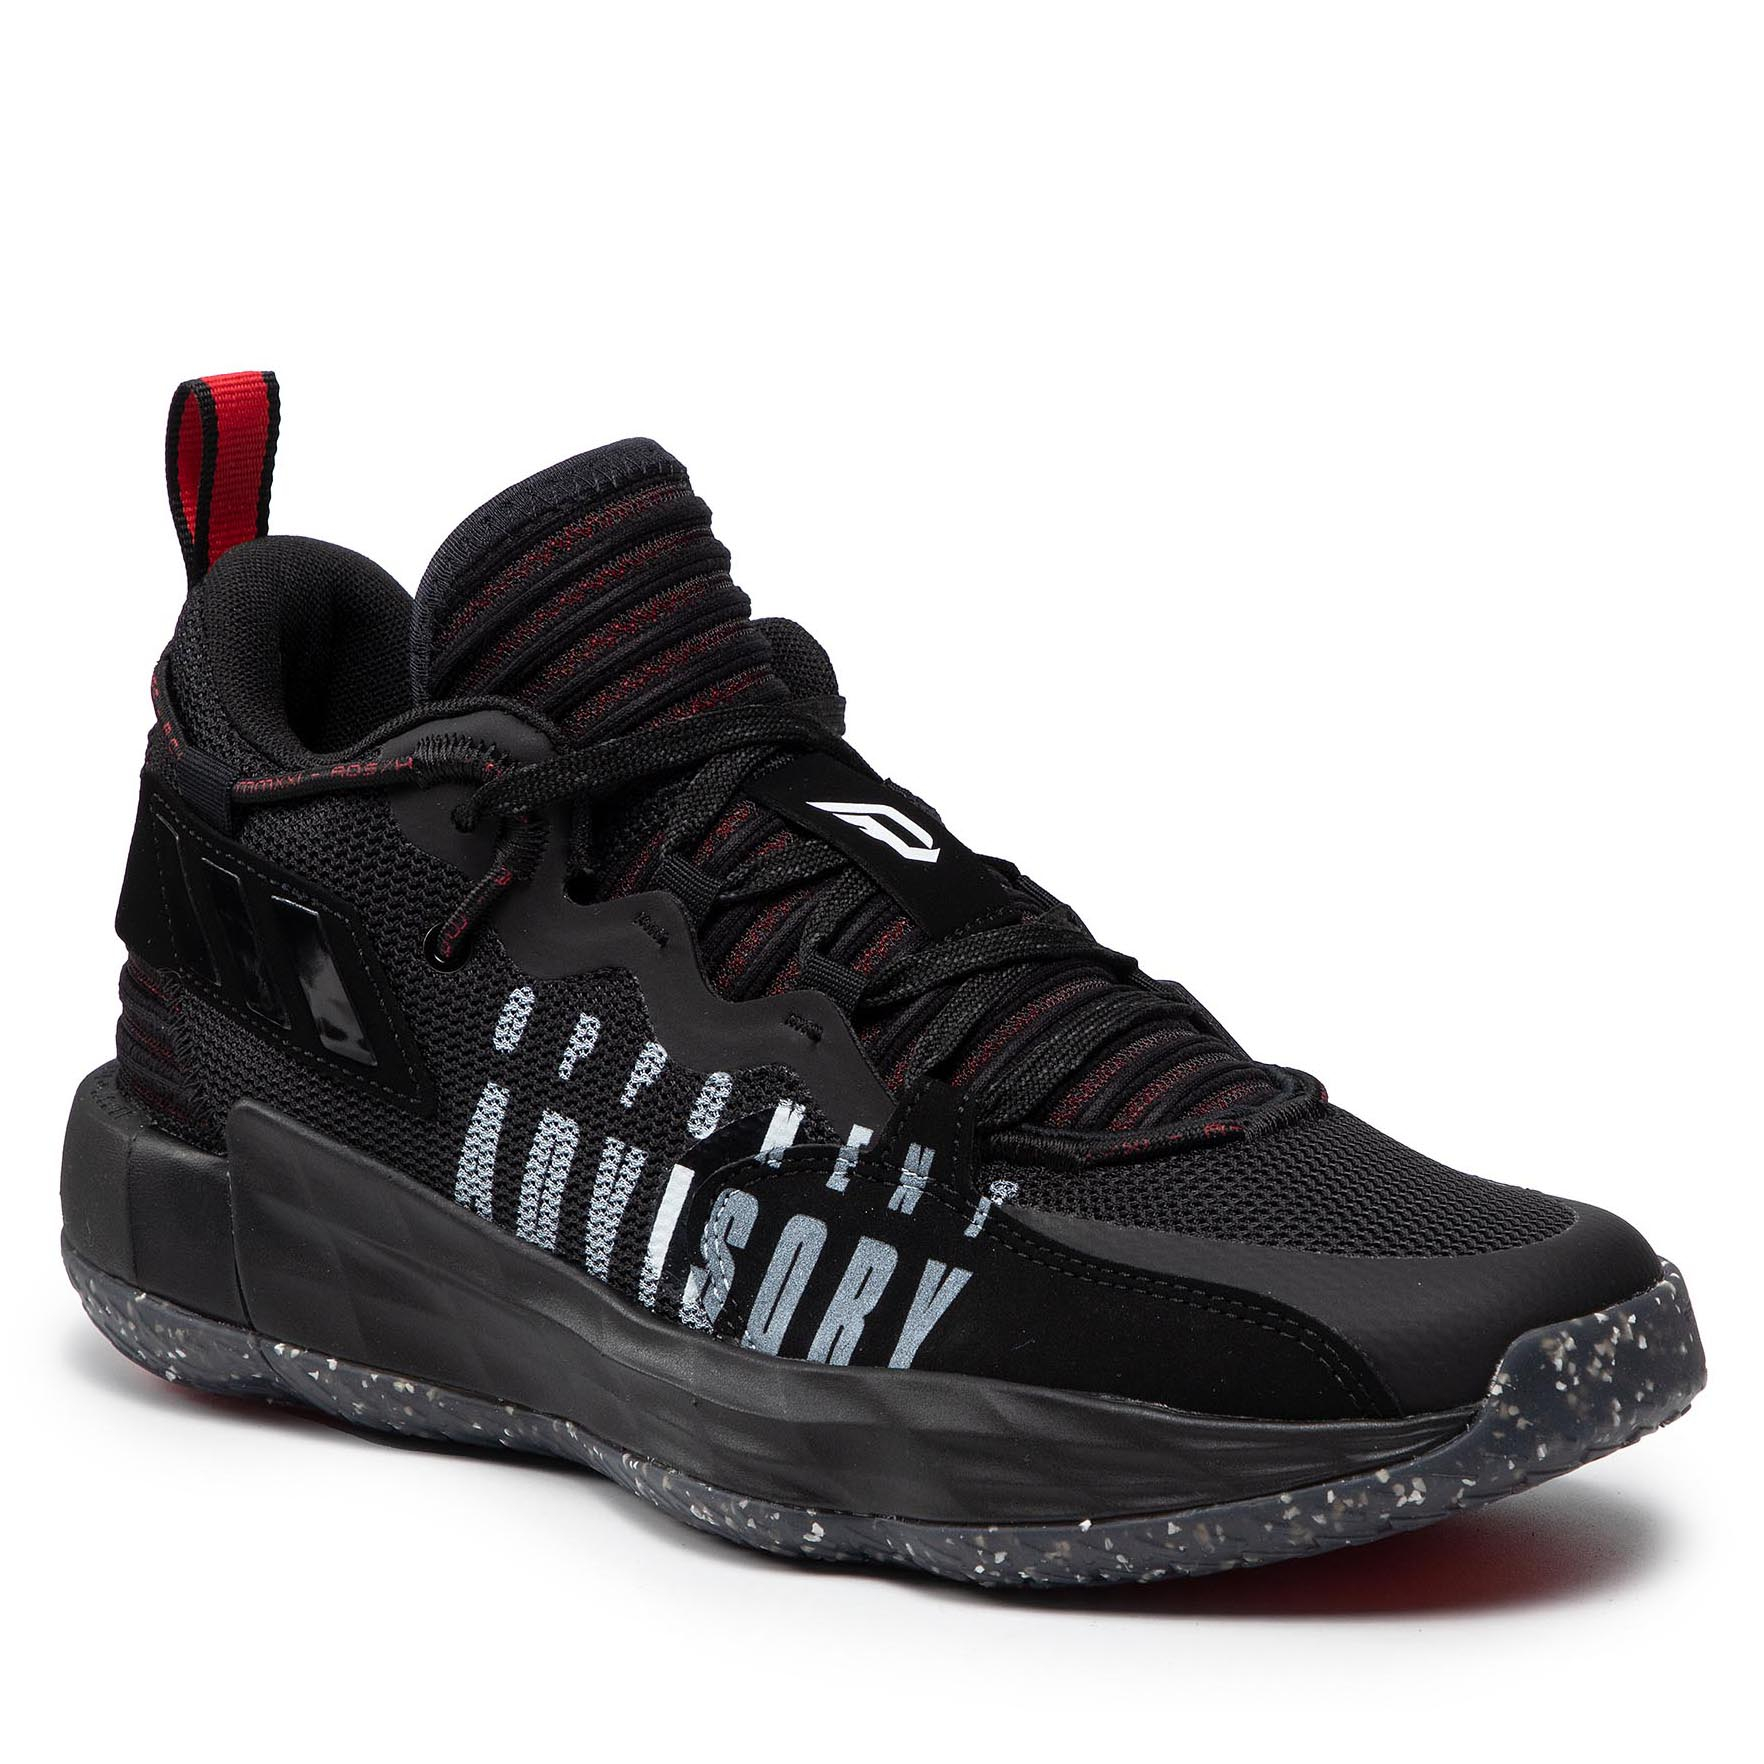 Image of Schuhe adidas - Dame 7 Extply FY9939 Cblack/Ftwwht/Vivred